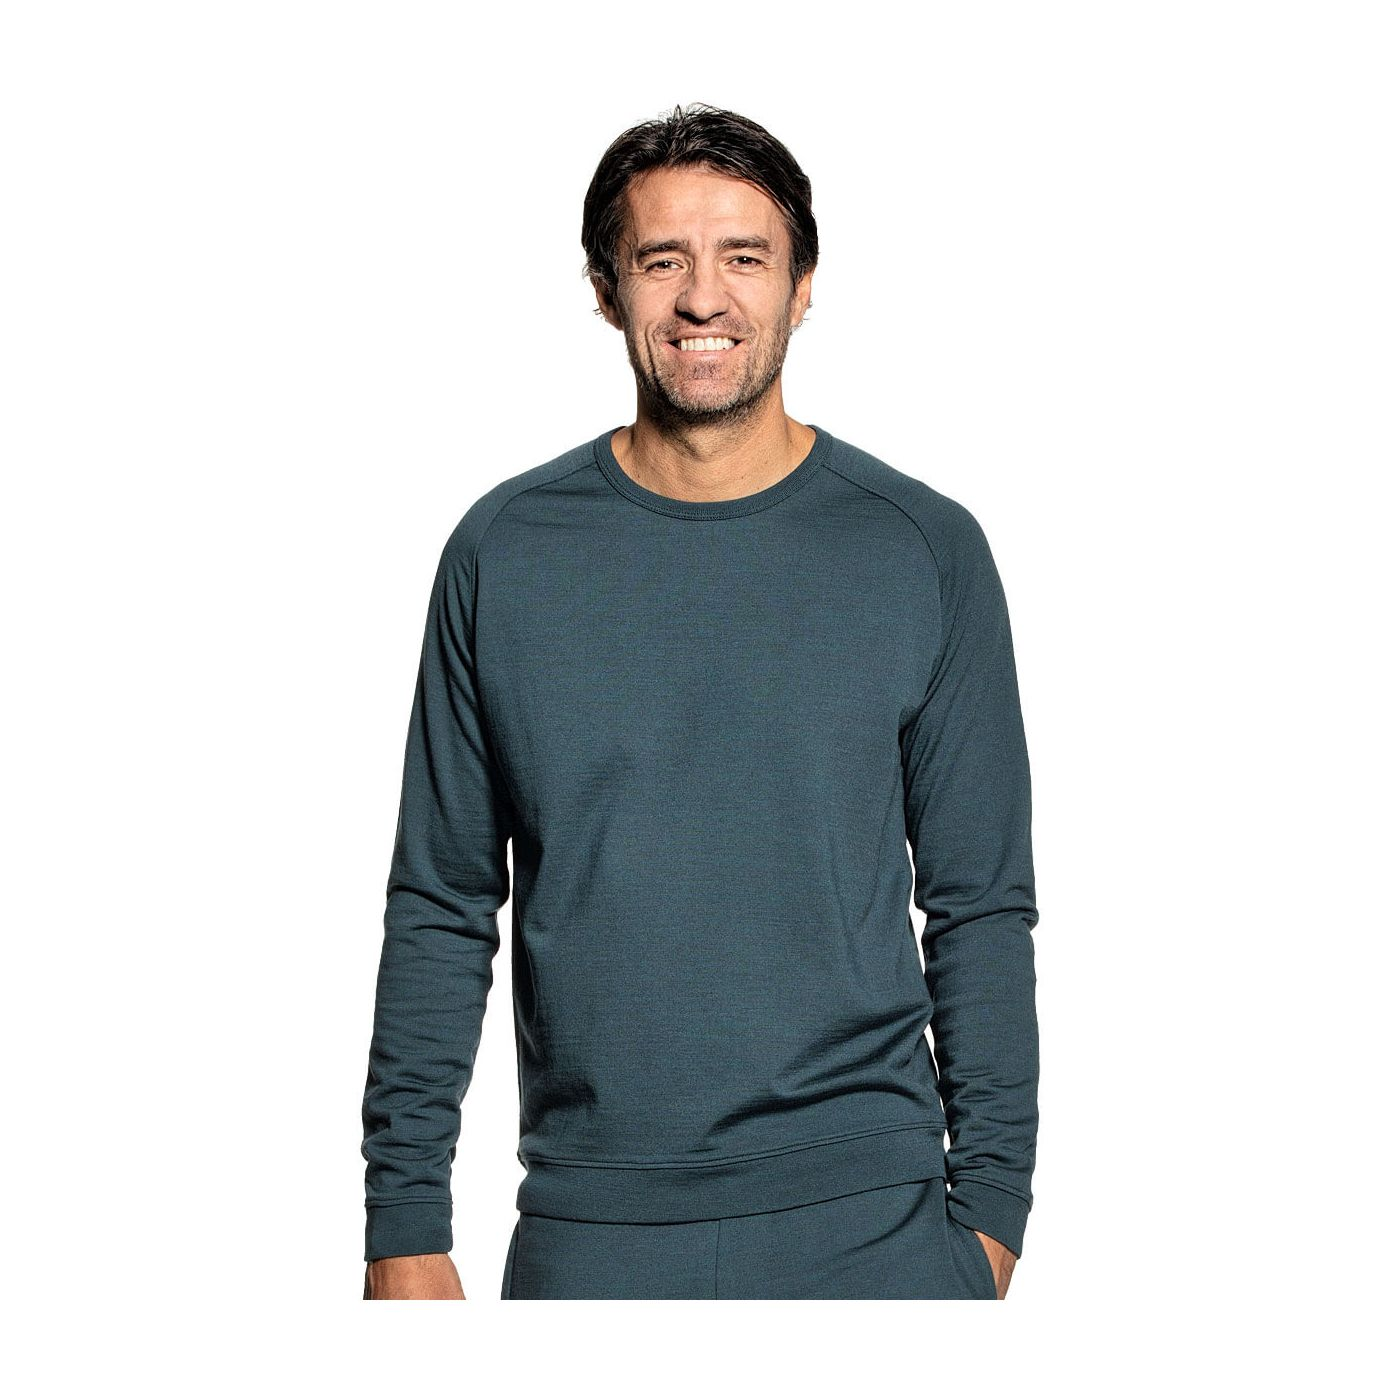 Sweatshirt for men made of Merino wool in Blue green